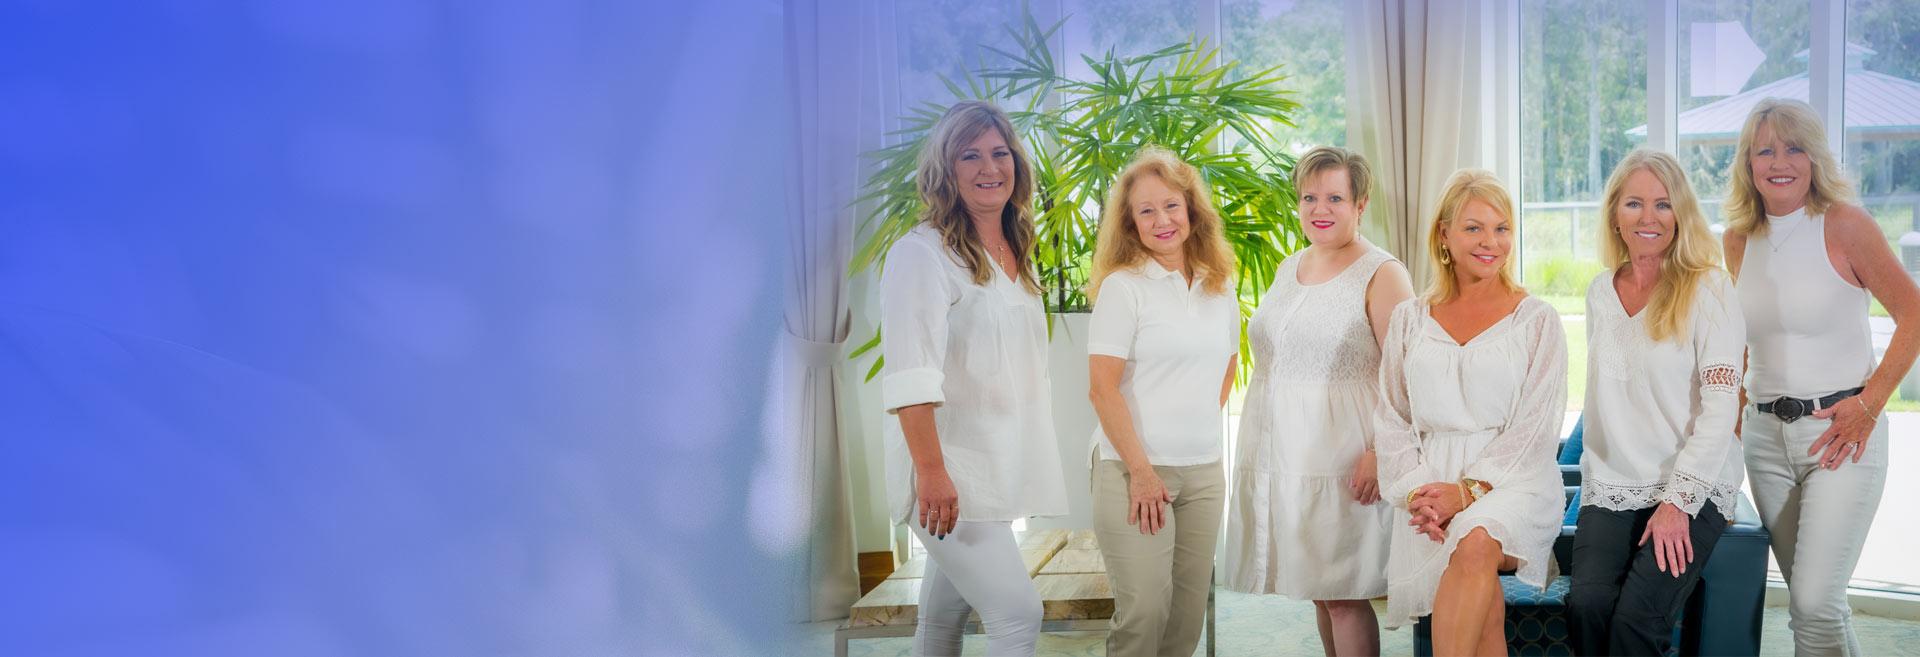 Salon Professionals Team | Senior Salon & Spa Management Florida